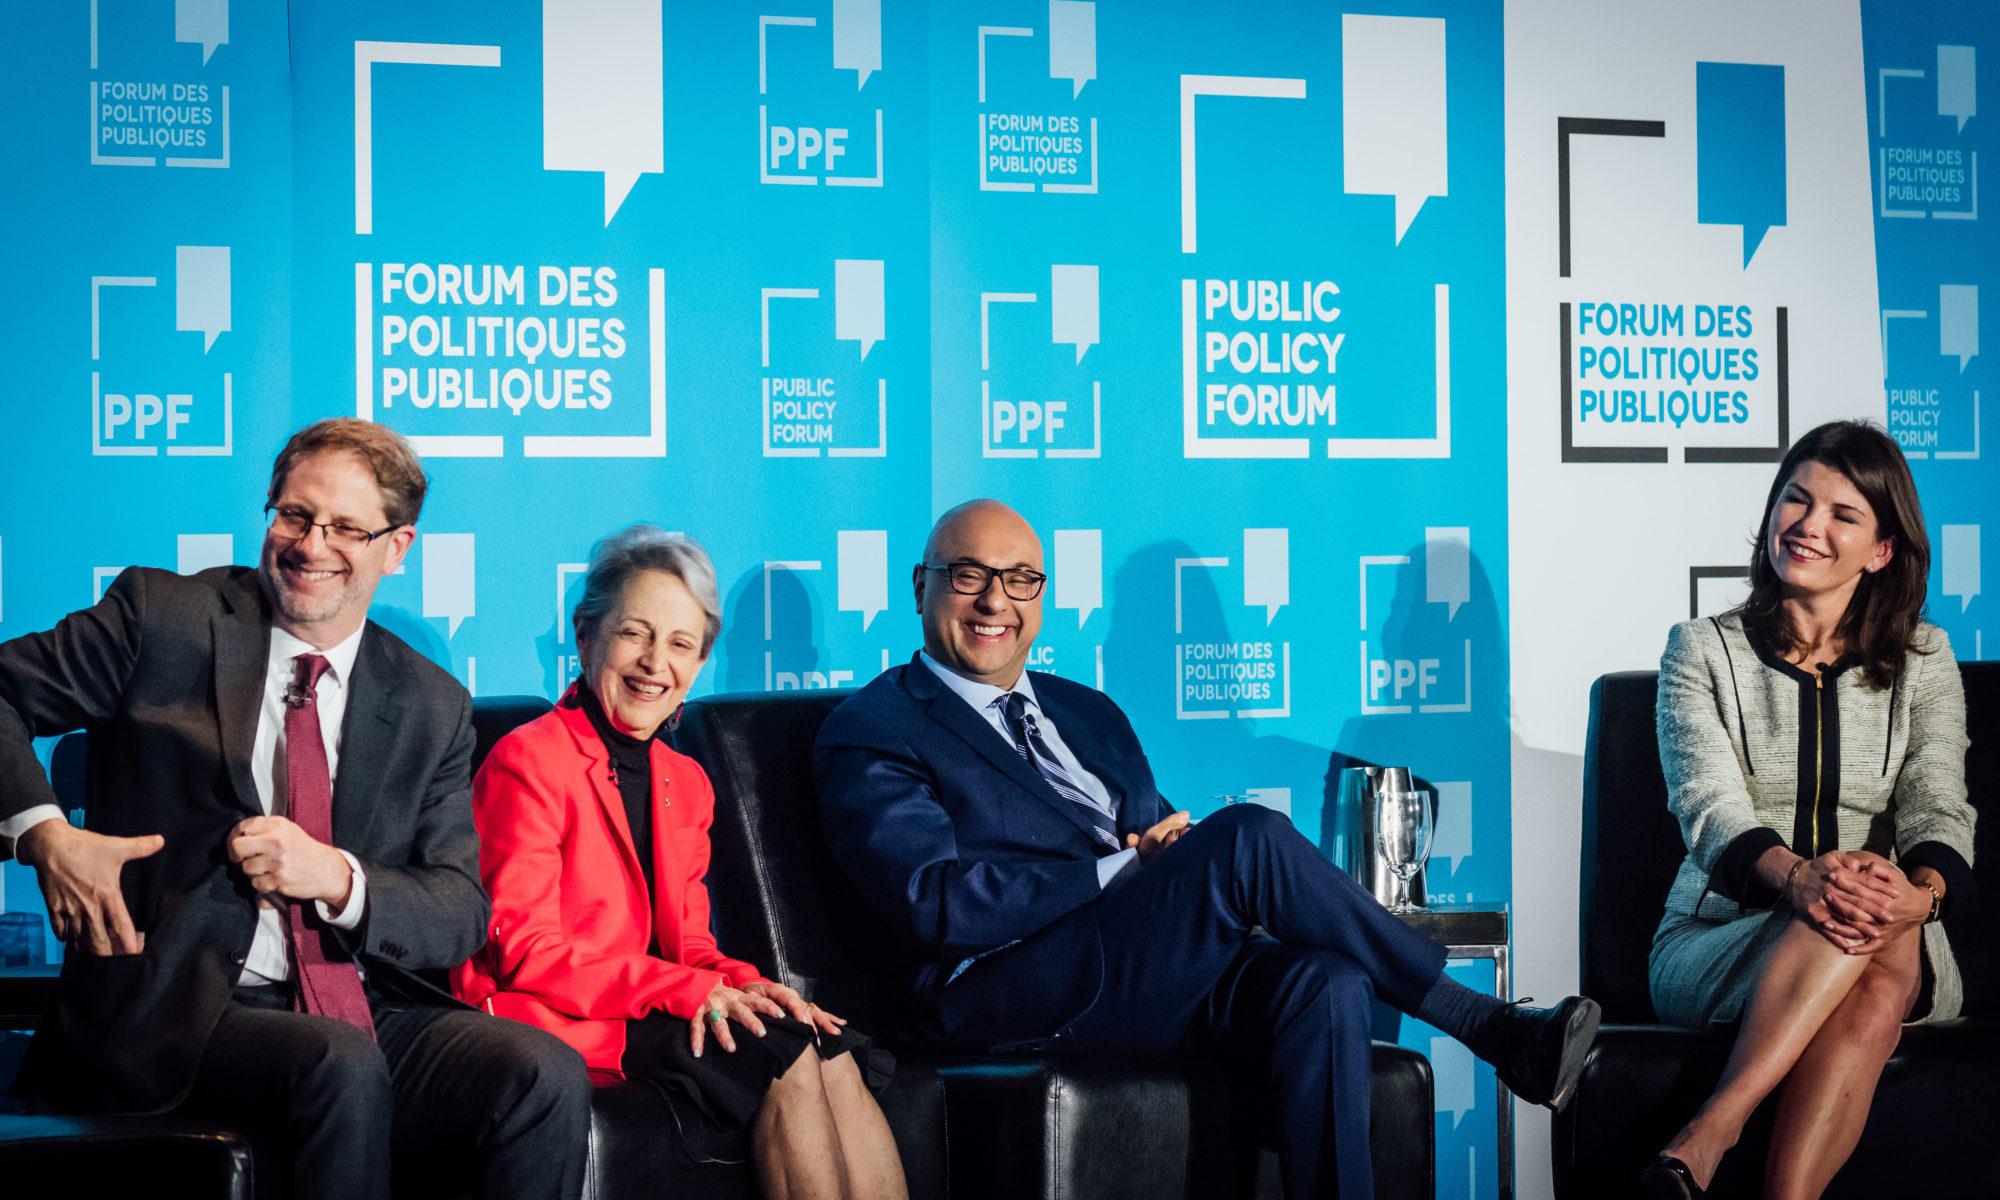 Edward Greenspon, Janice Stein, Ali Velshi and Luiza Savage smile on stage